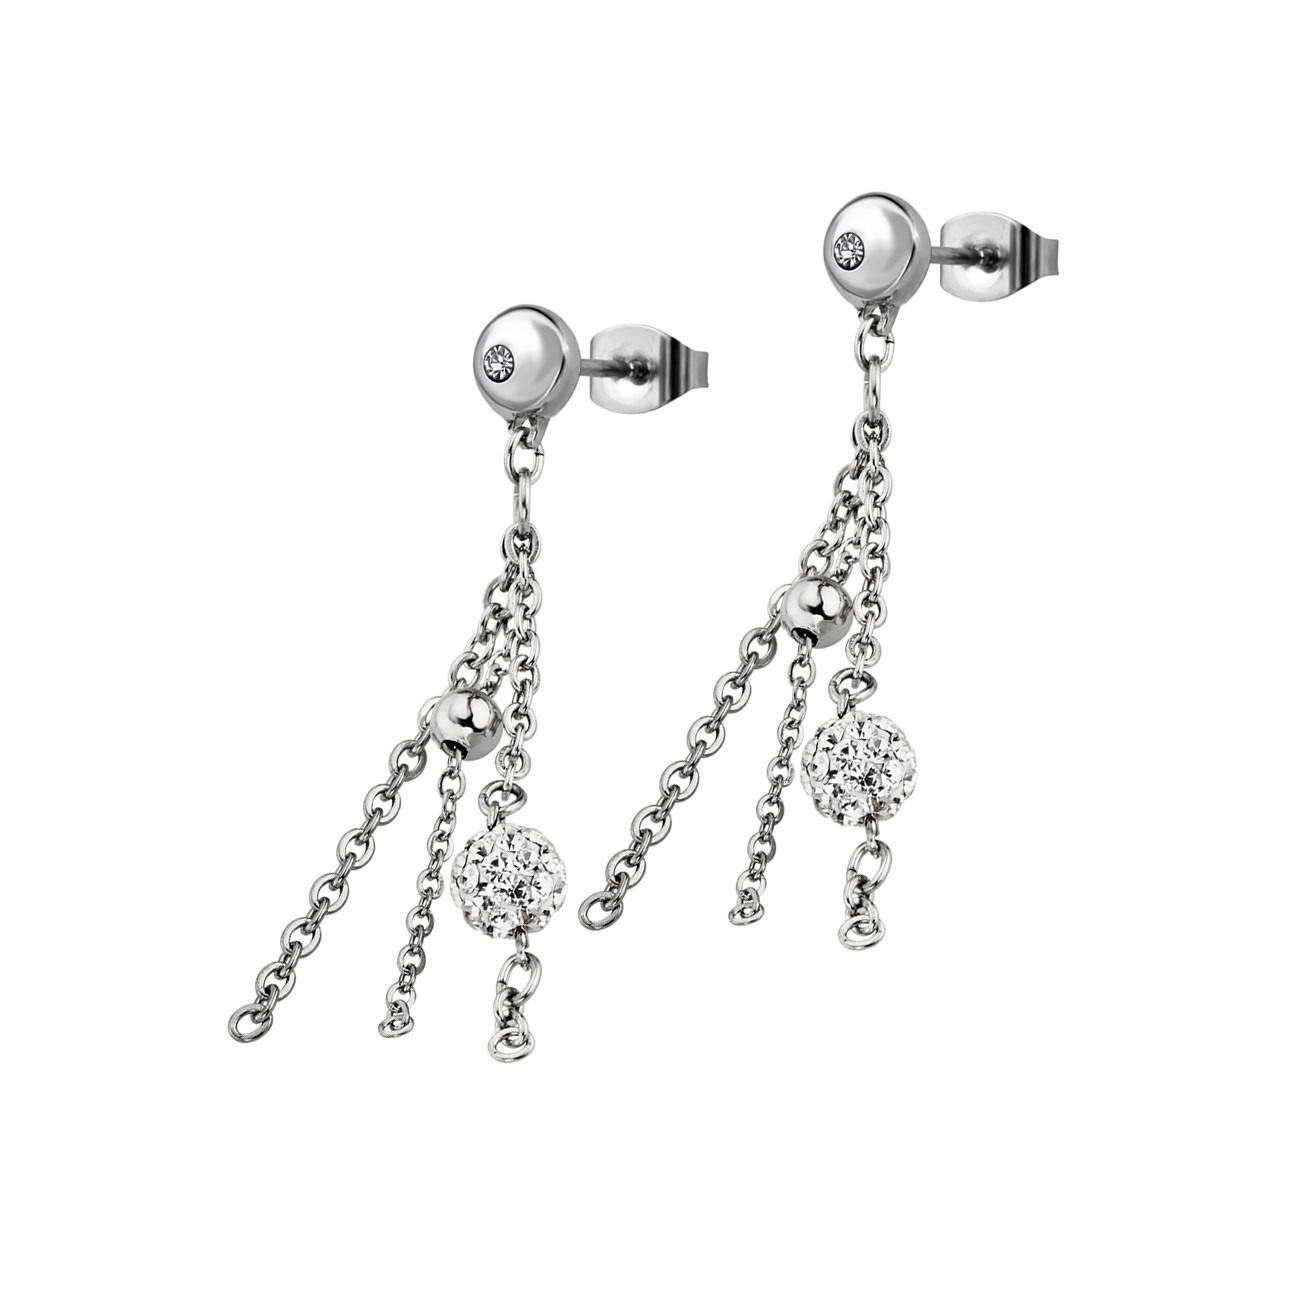 LOTUS Style Ohrringe Damen Edelstahl silber LS1776-4/1 Ohrstecker JLS1776-4-1